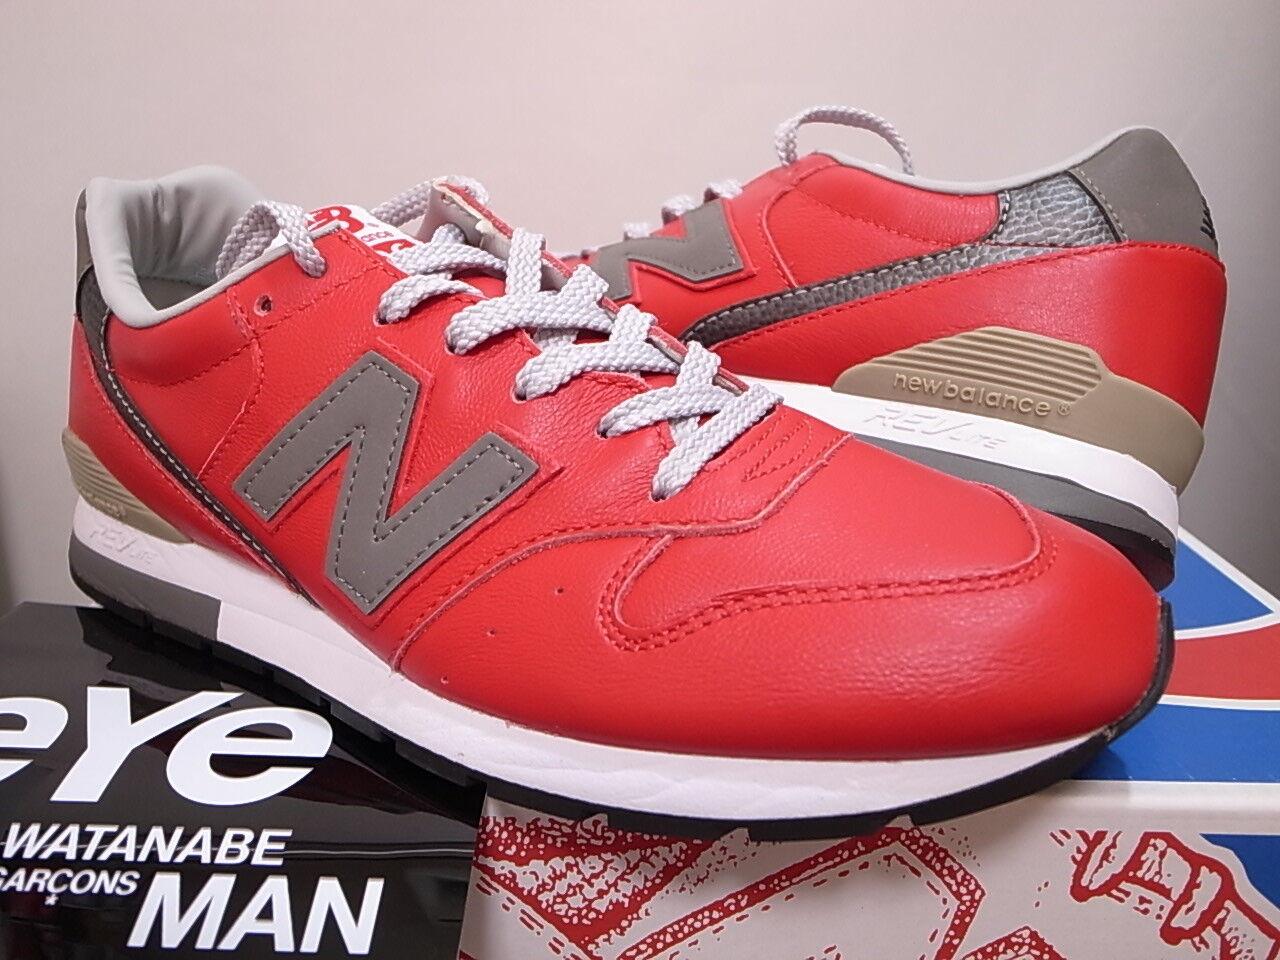 2014 NEW BALANCE x eYe JUNYA WATANABE MAN COMME DES GARCONS MRL996CO RED size 9